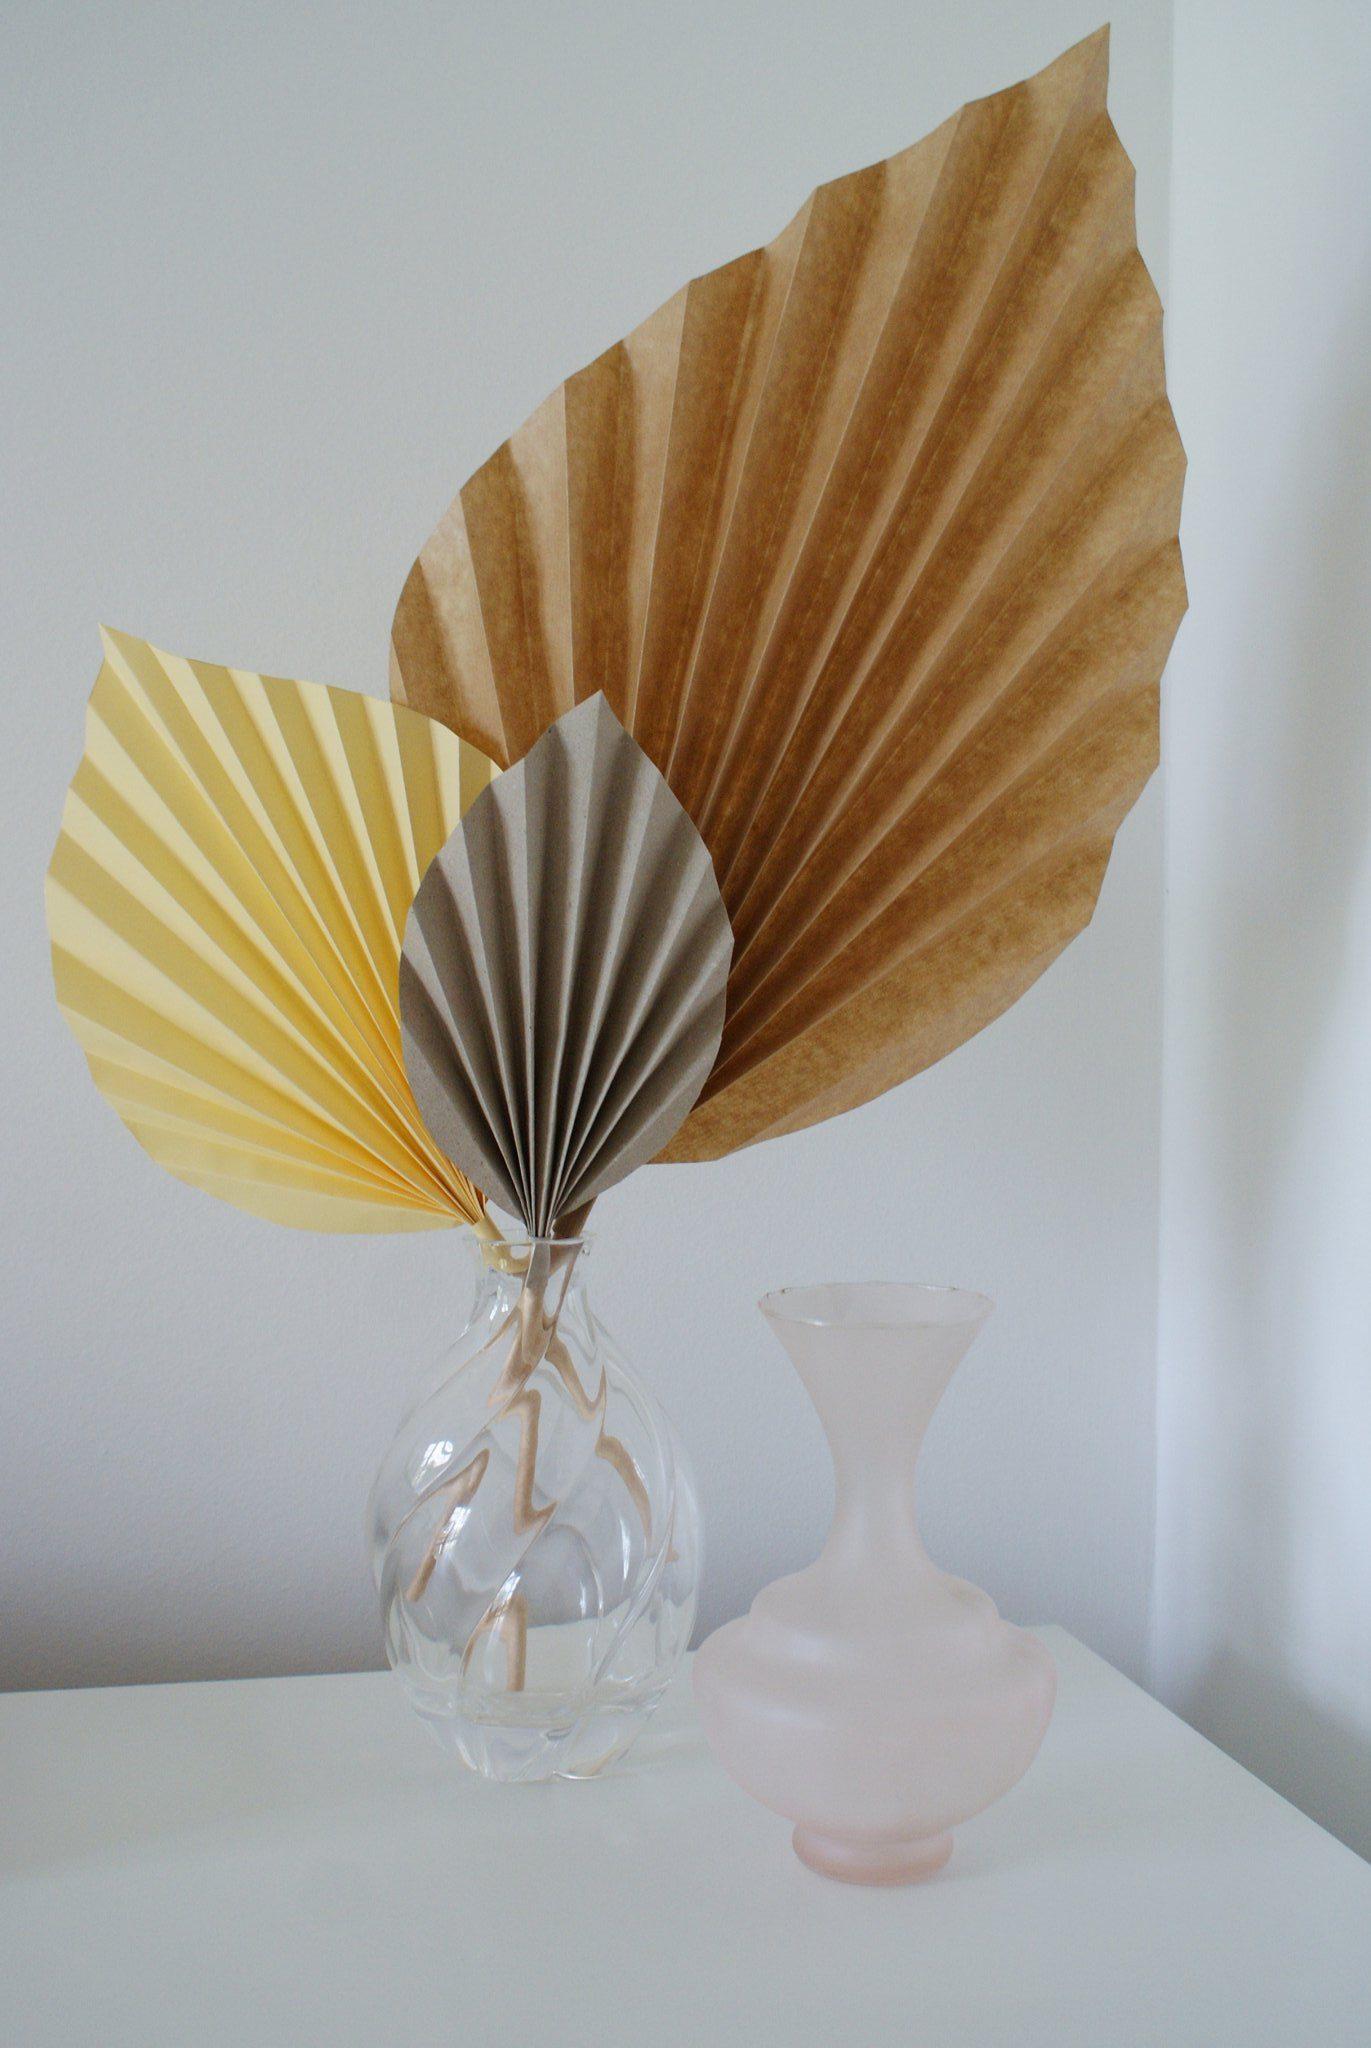 diy palm paper leaf leaves decor idea handmade craft easy simple tutorial home decoration neutral minimalist francinesplaceblog